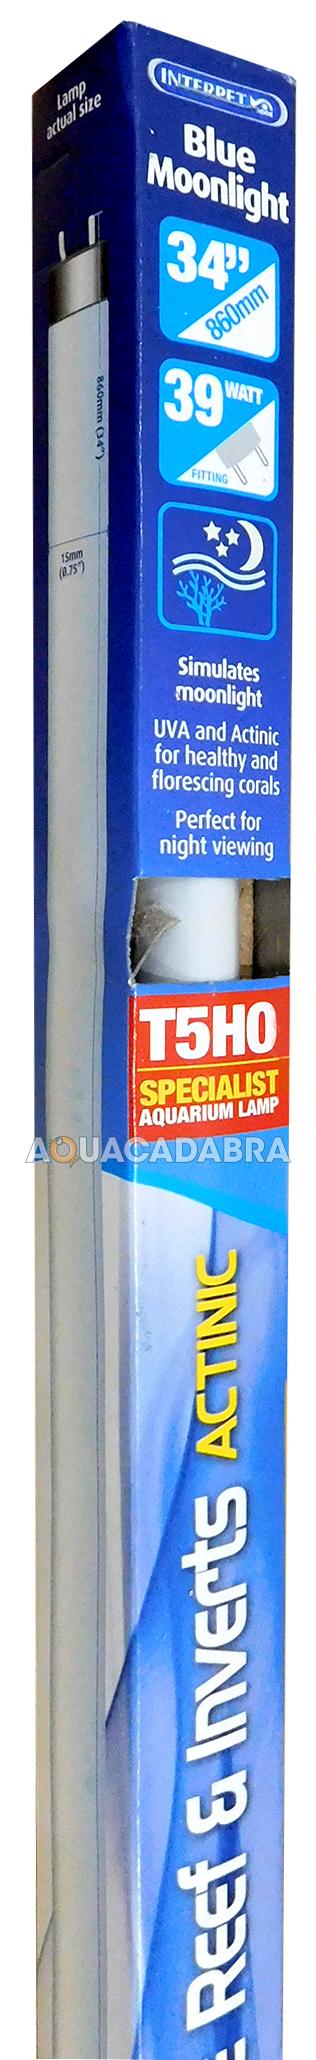 INTERPET-BLUE-MOON-MOONLIGHT-T5-T8-FISH-TANK-LIGHT-LIGHTING-MARINE-REEF-ACTINIC